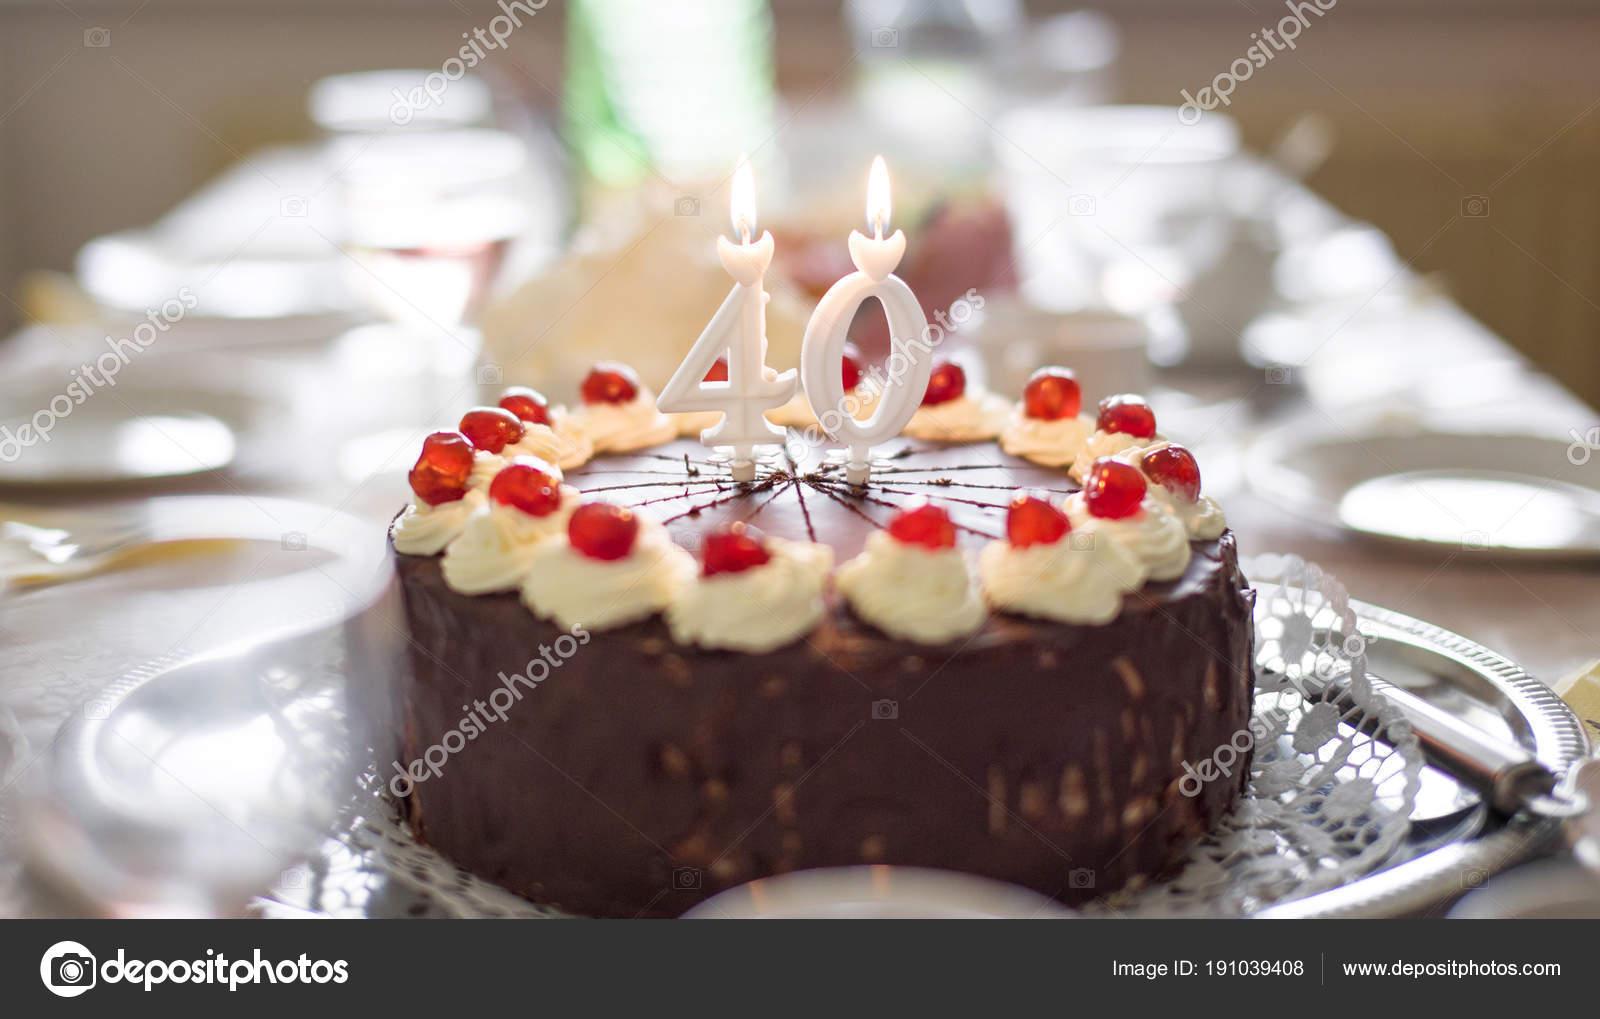 Happy 40th Birthday Cake On Table Stock Photo Sakkmesterke